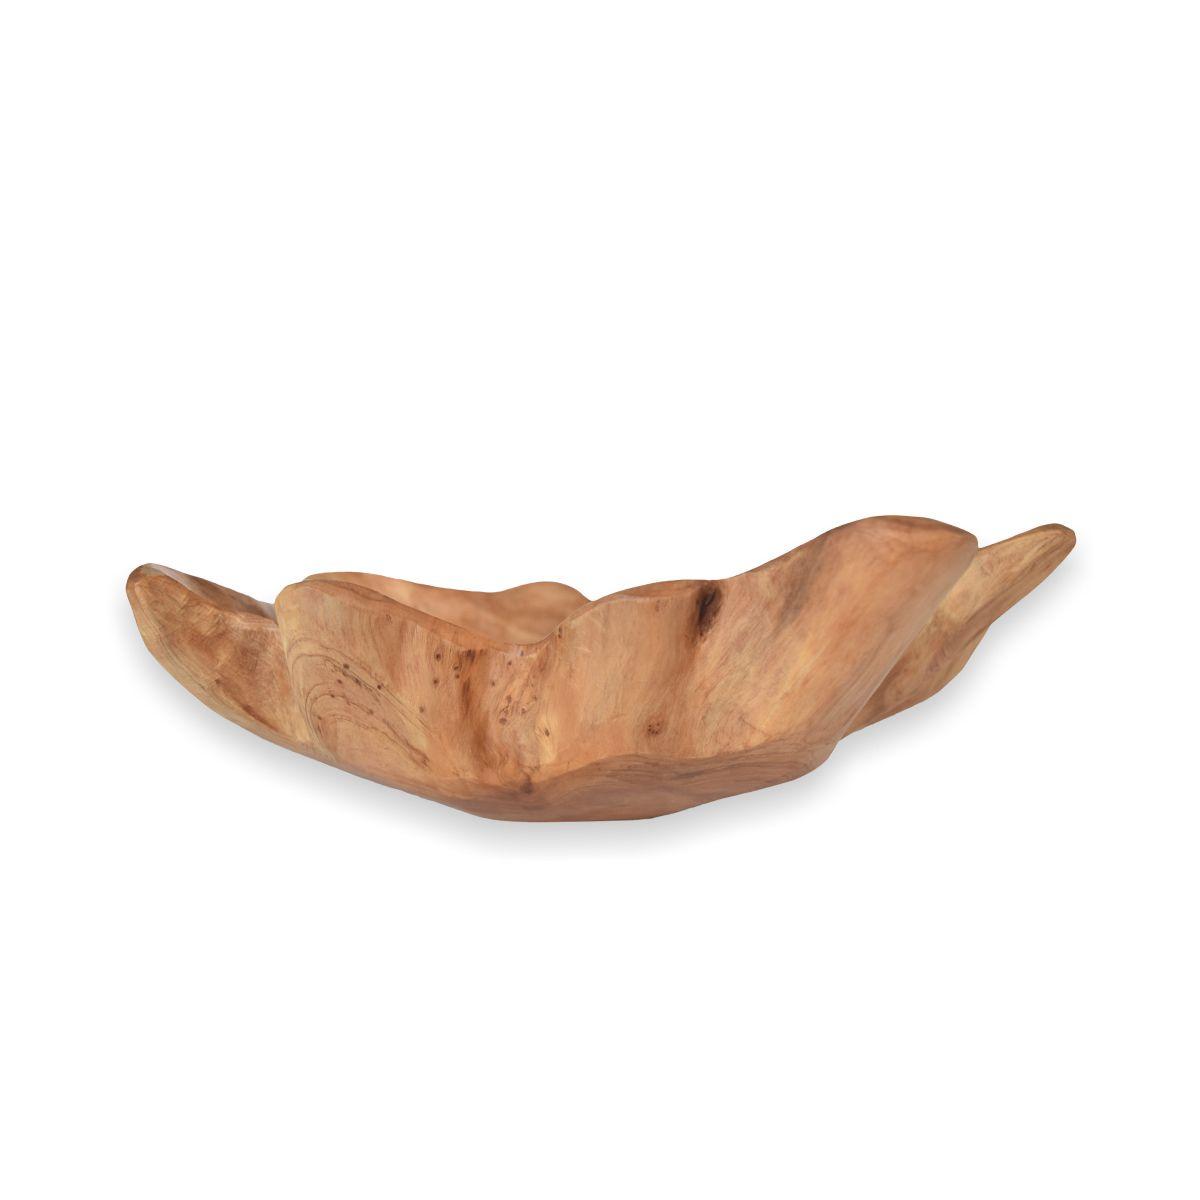 Cachepot Rustic Madeira Artesanal Exclusiva 3